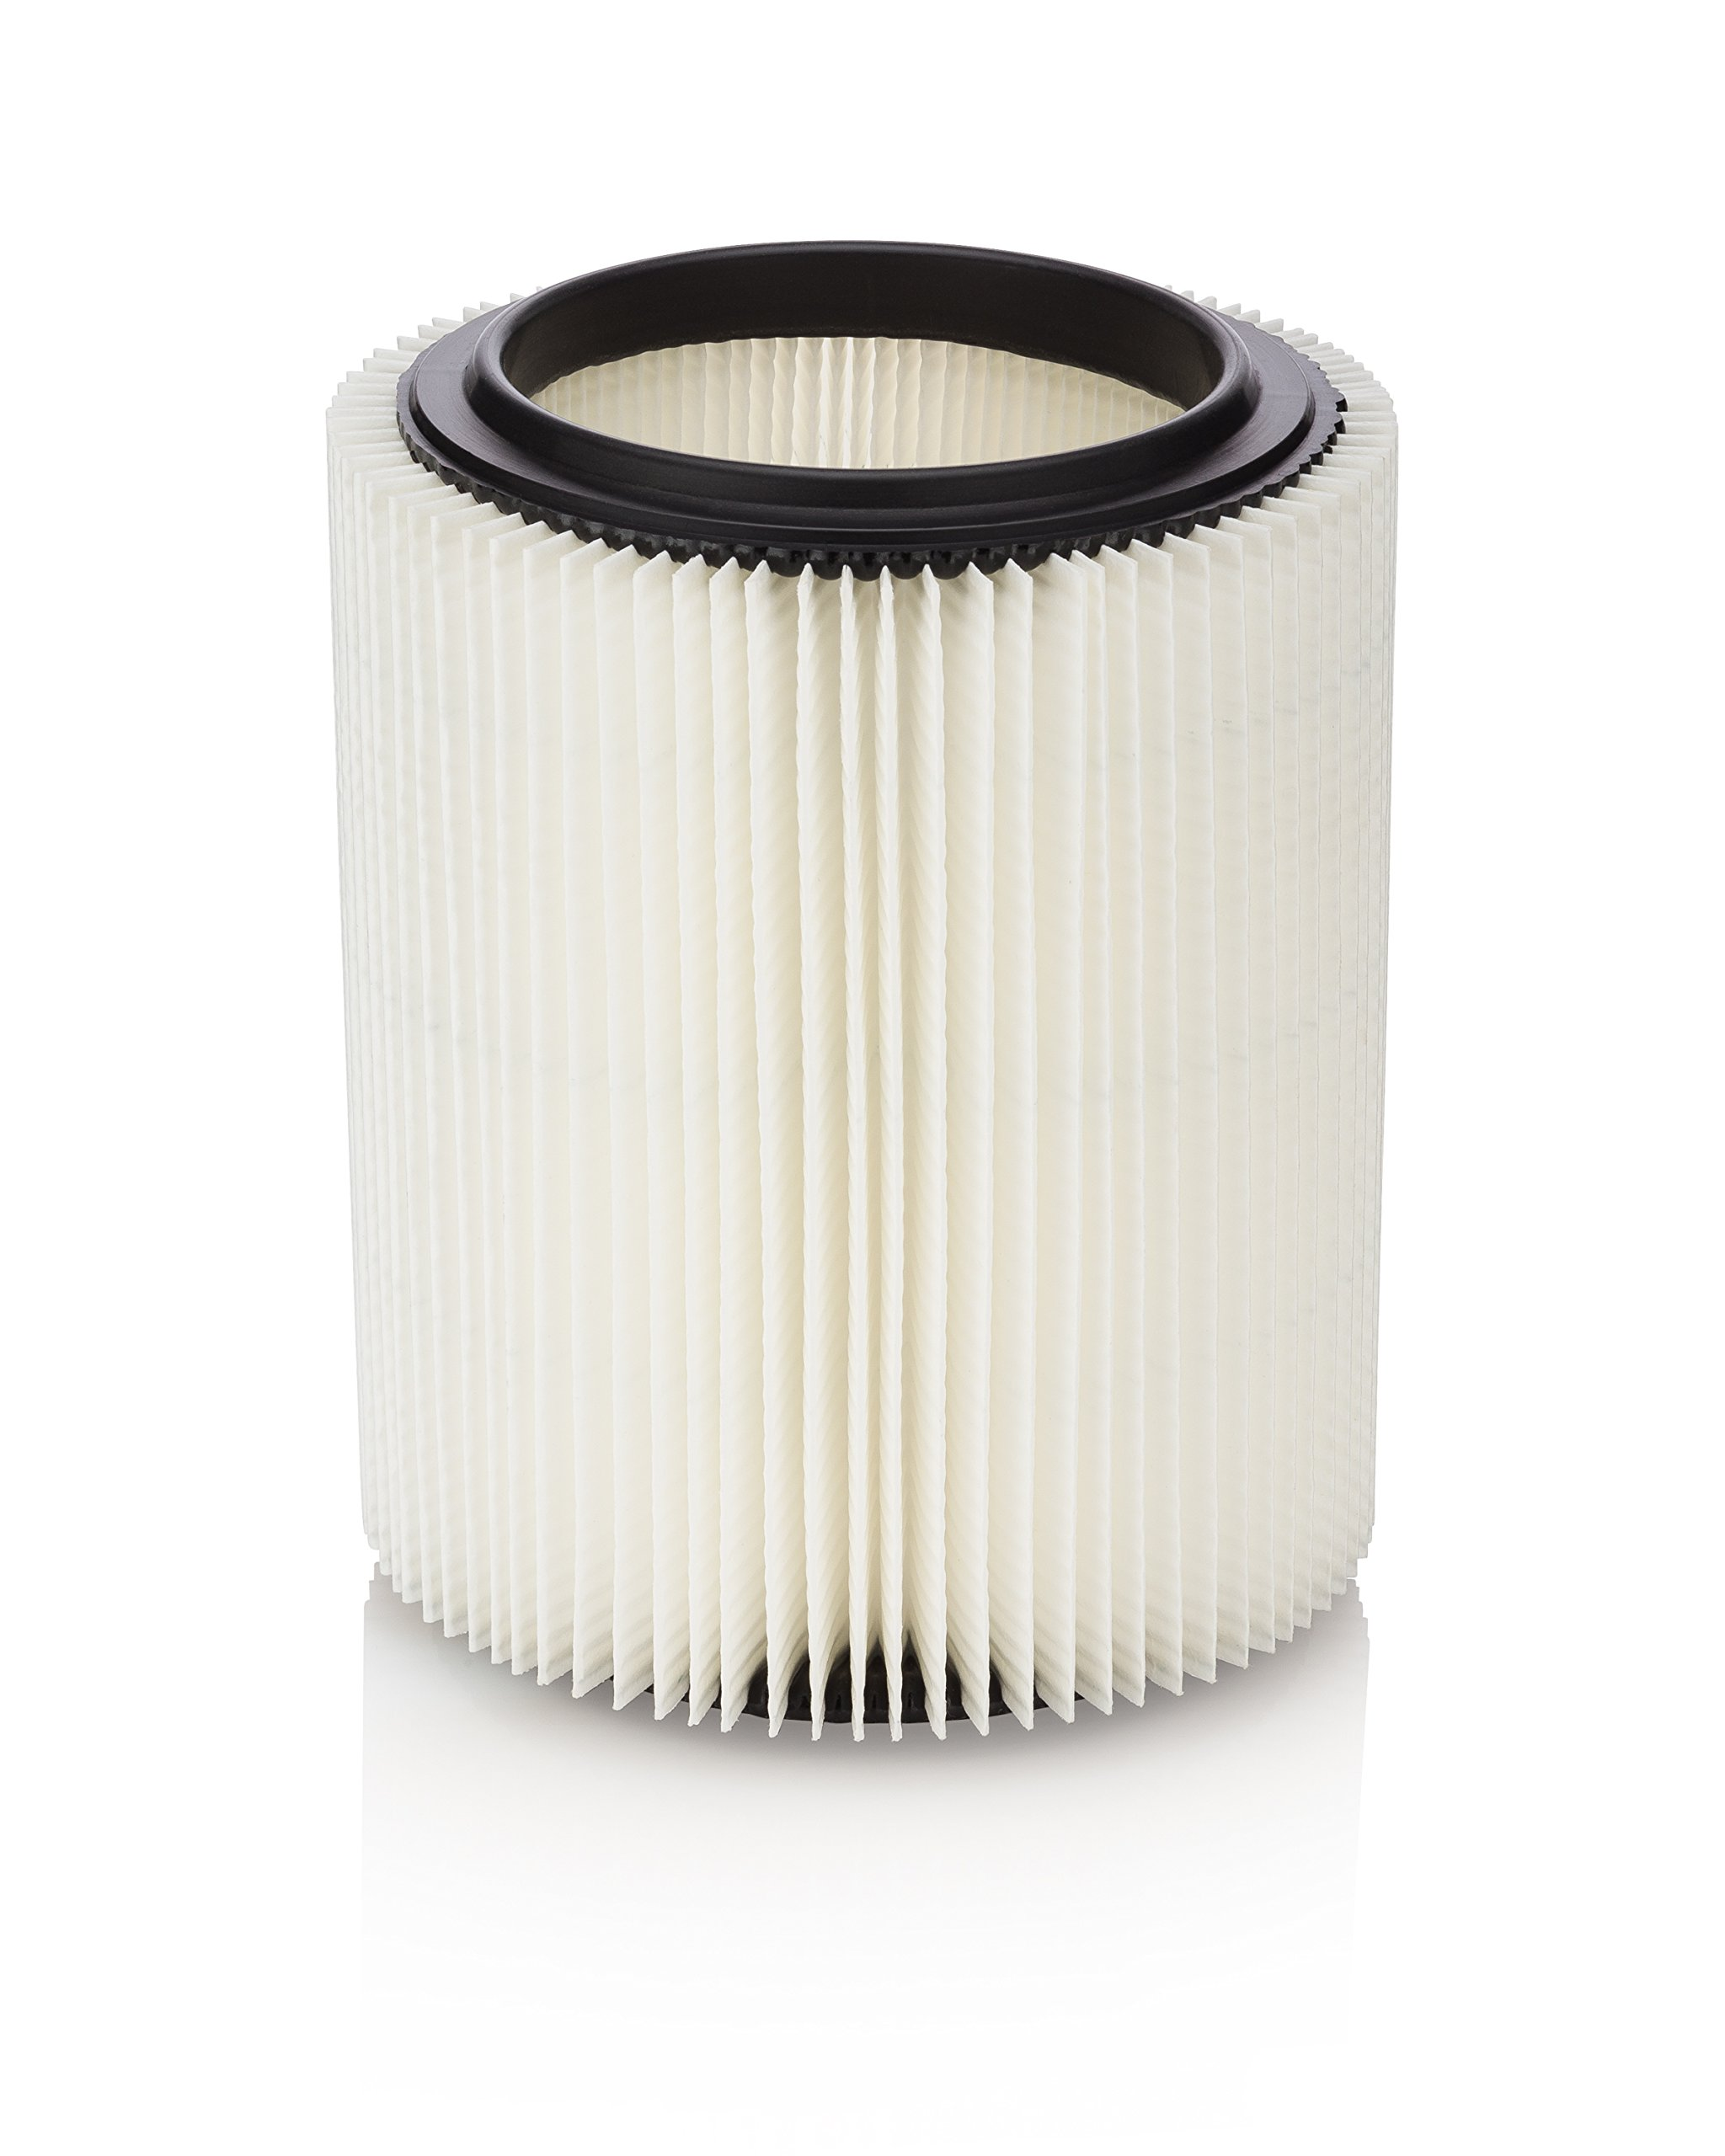 Kopach Replacement Filter for Craftsman and Ridgid Shop Vacs Part # 9-17816 & Part # VF4000, 4 Pack, Original Filter